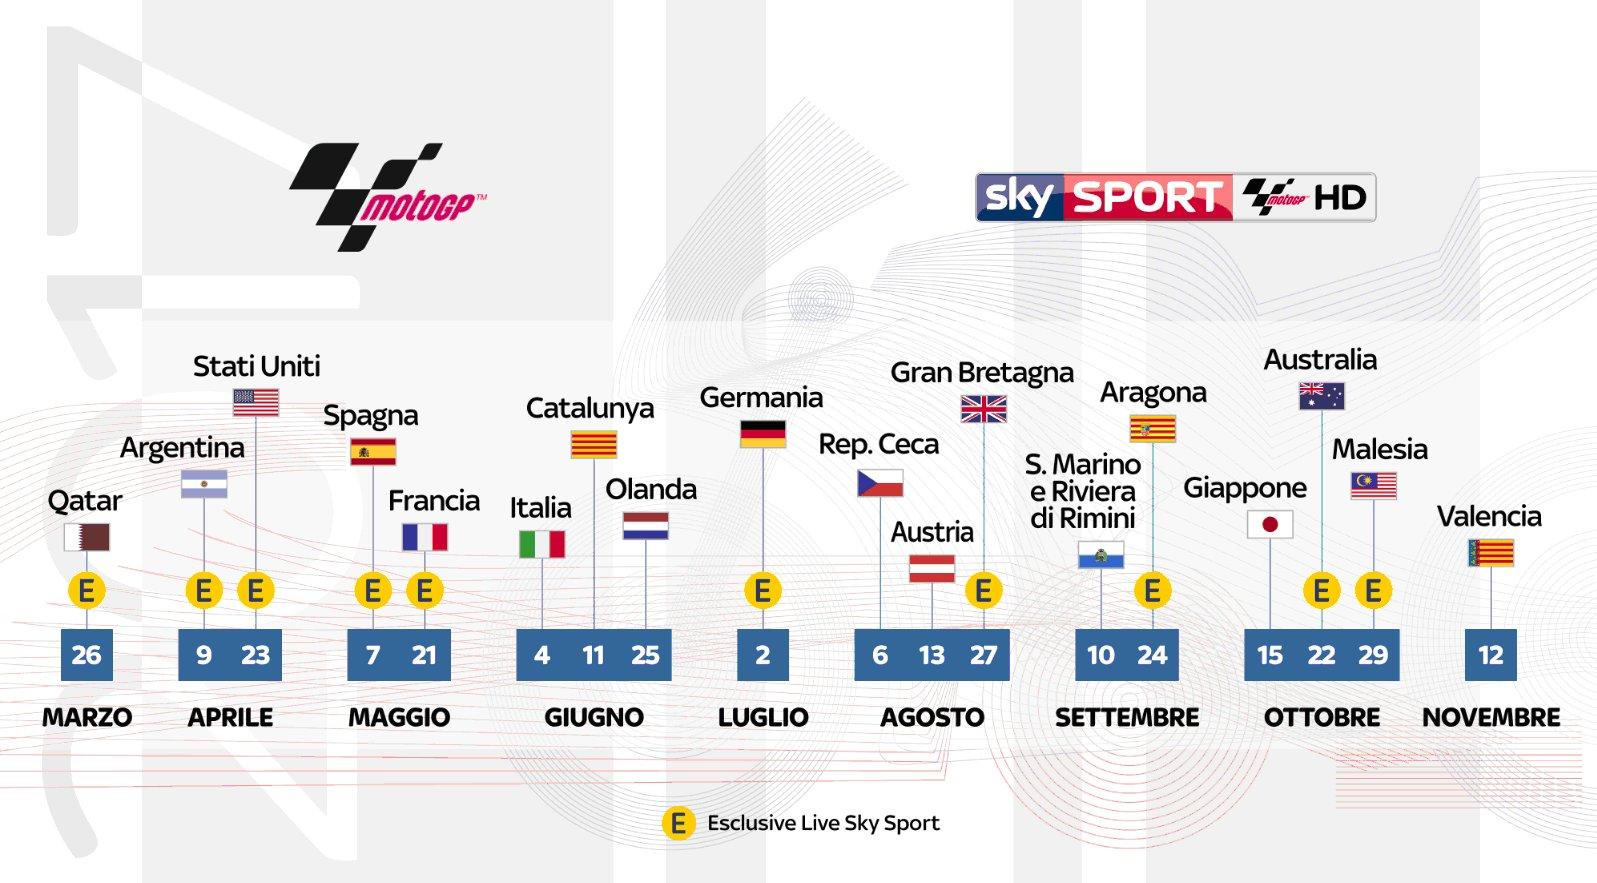 MotoGP Americas 2017, Gara - Diretta esclusiva Sky Sport MotoGP HD, differita Tv8 - Digital-News